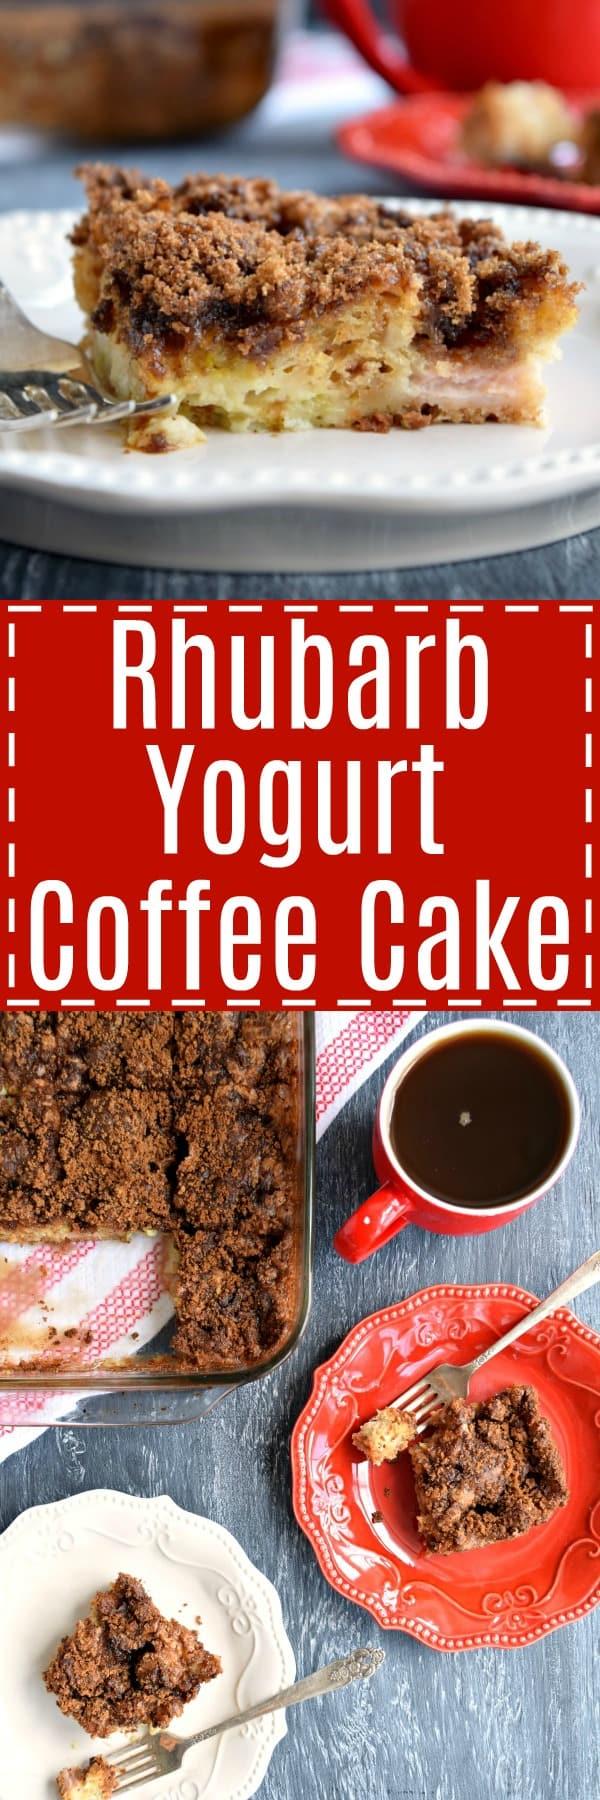 Rhubarb Yogurt Coffee Cake